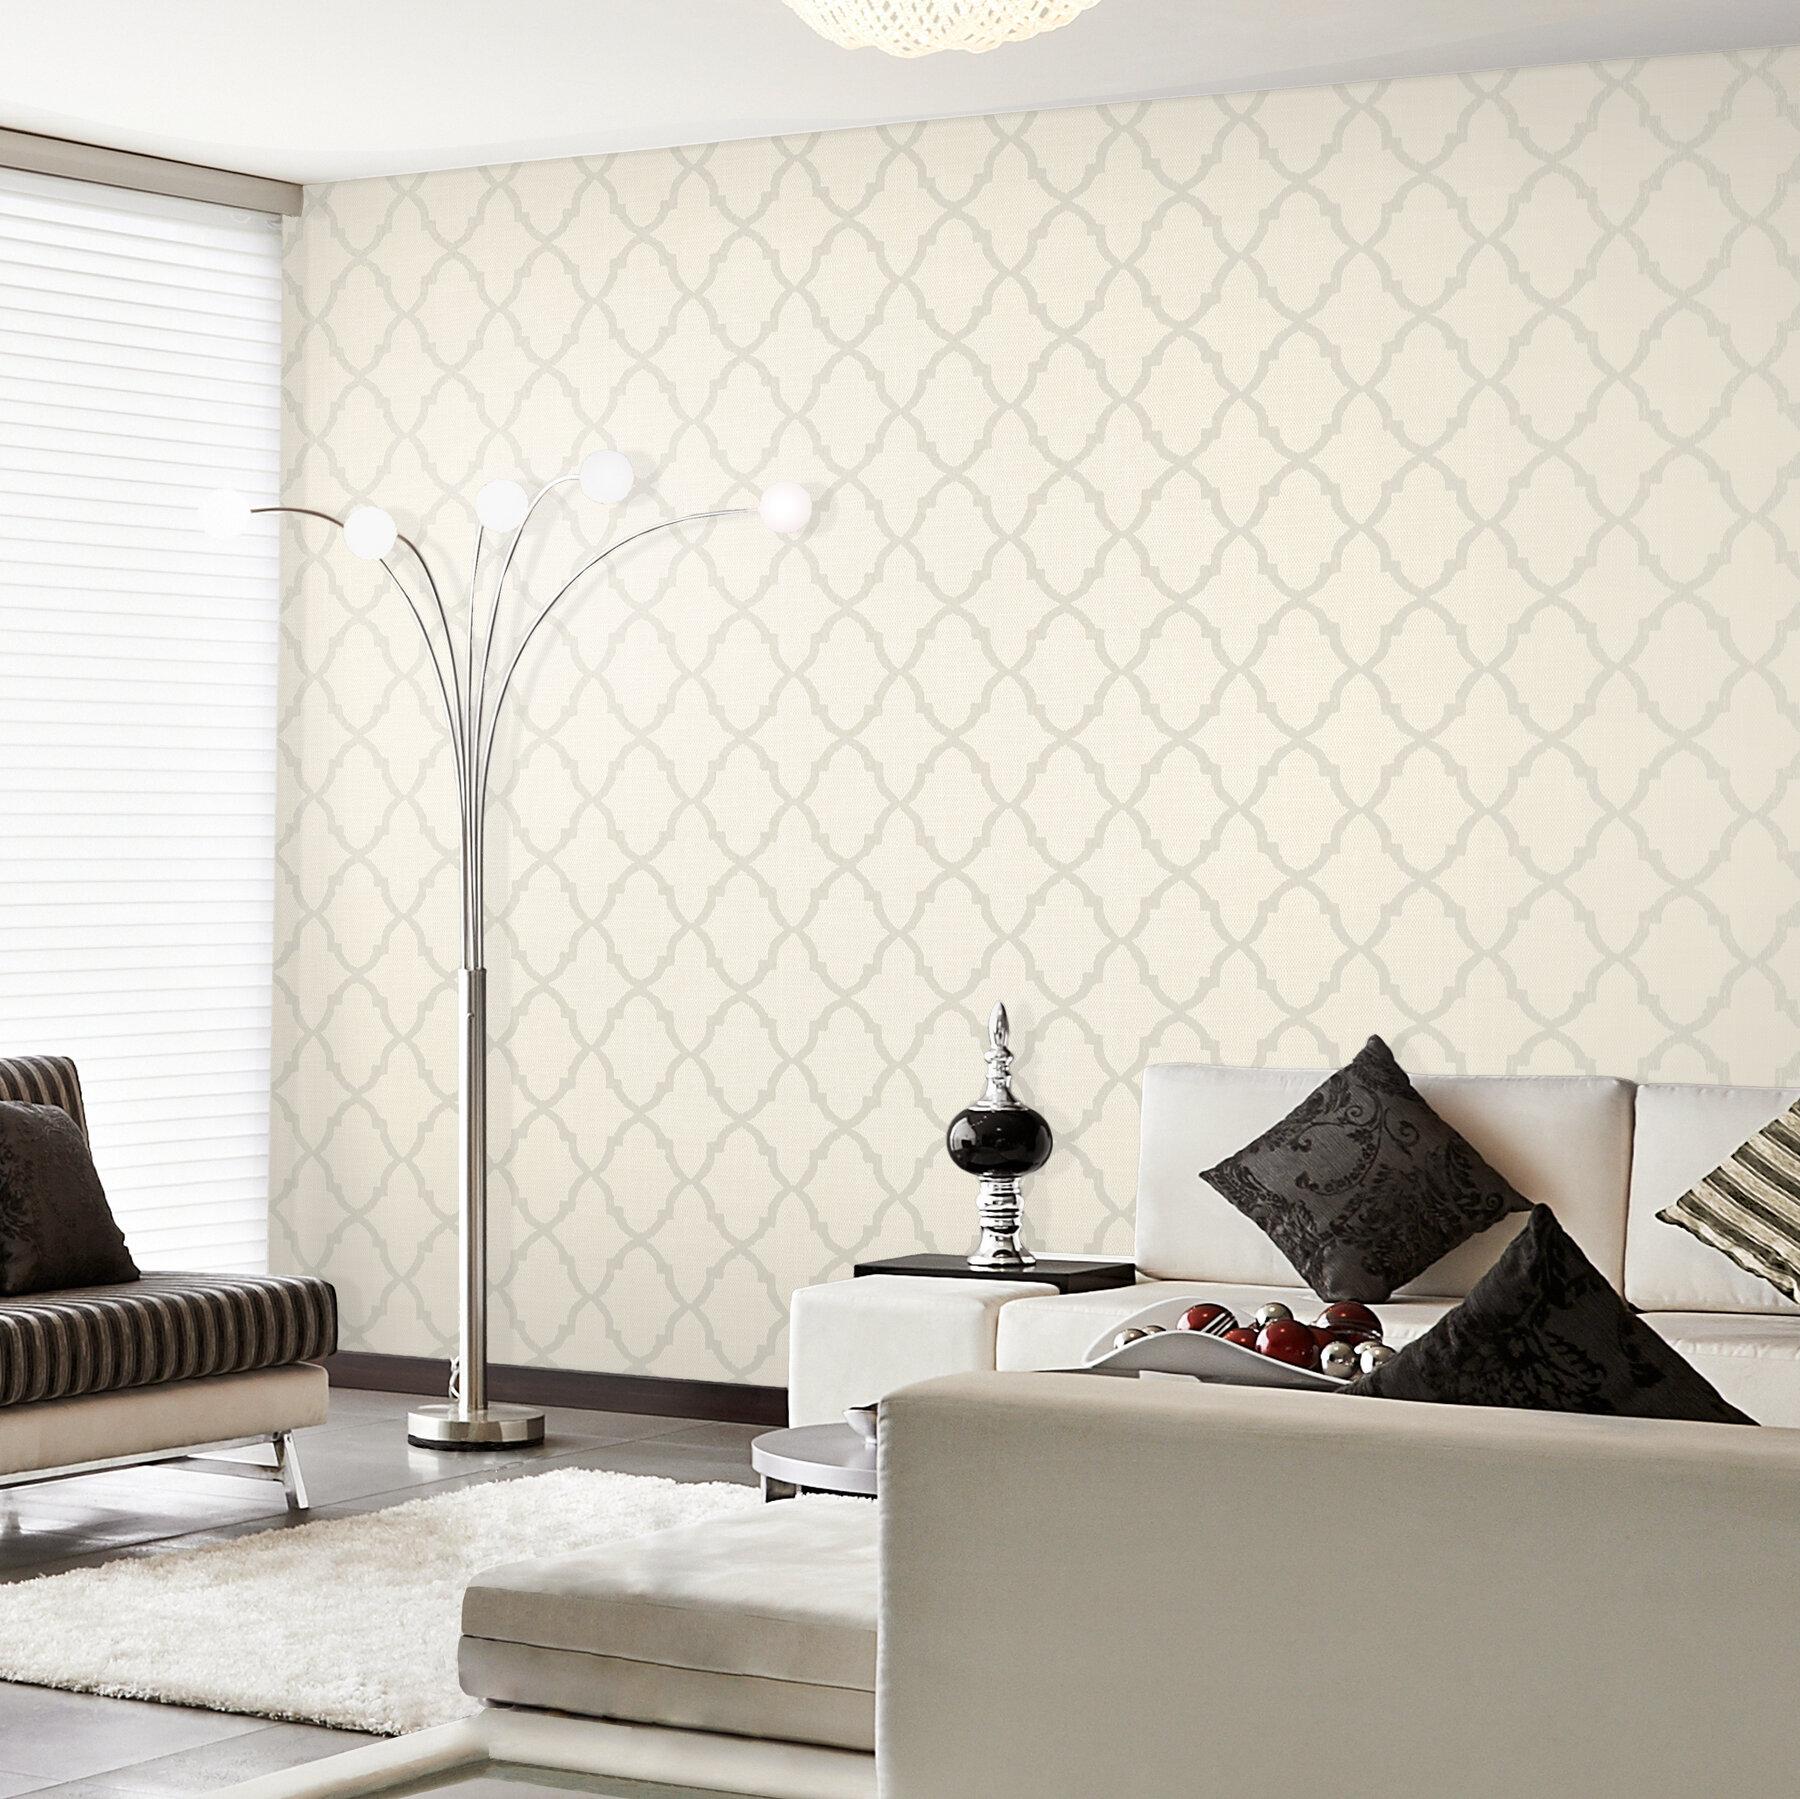 Prism oscar fretwork 33 39 x 20 5 trellis 3d embossed for 3d embossed wallpaper